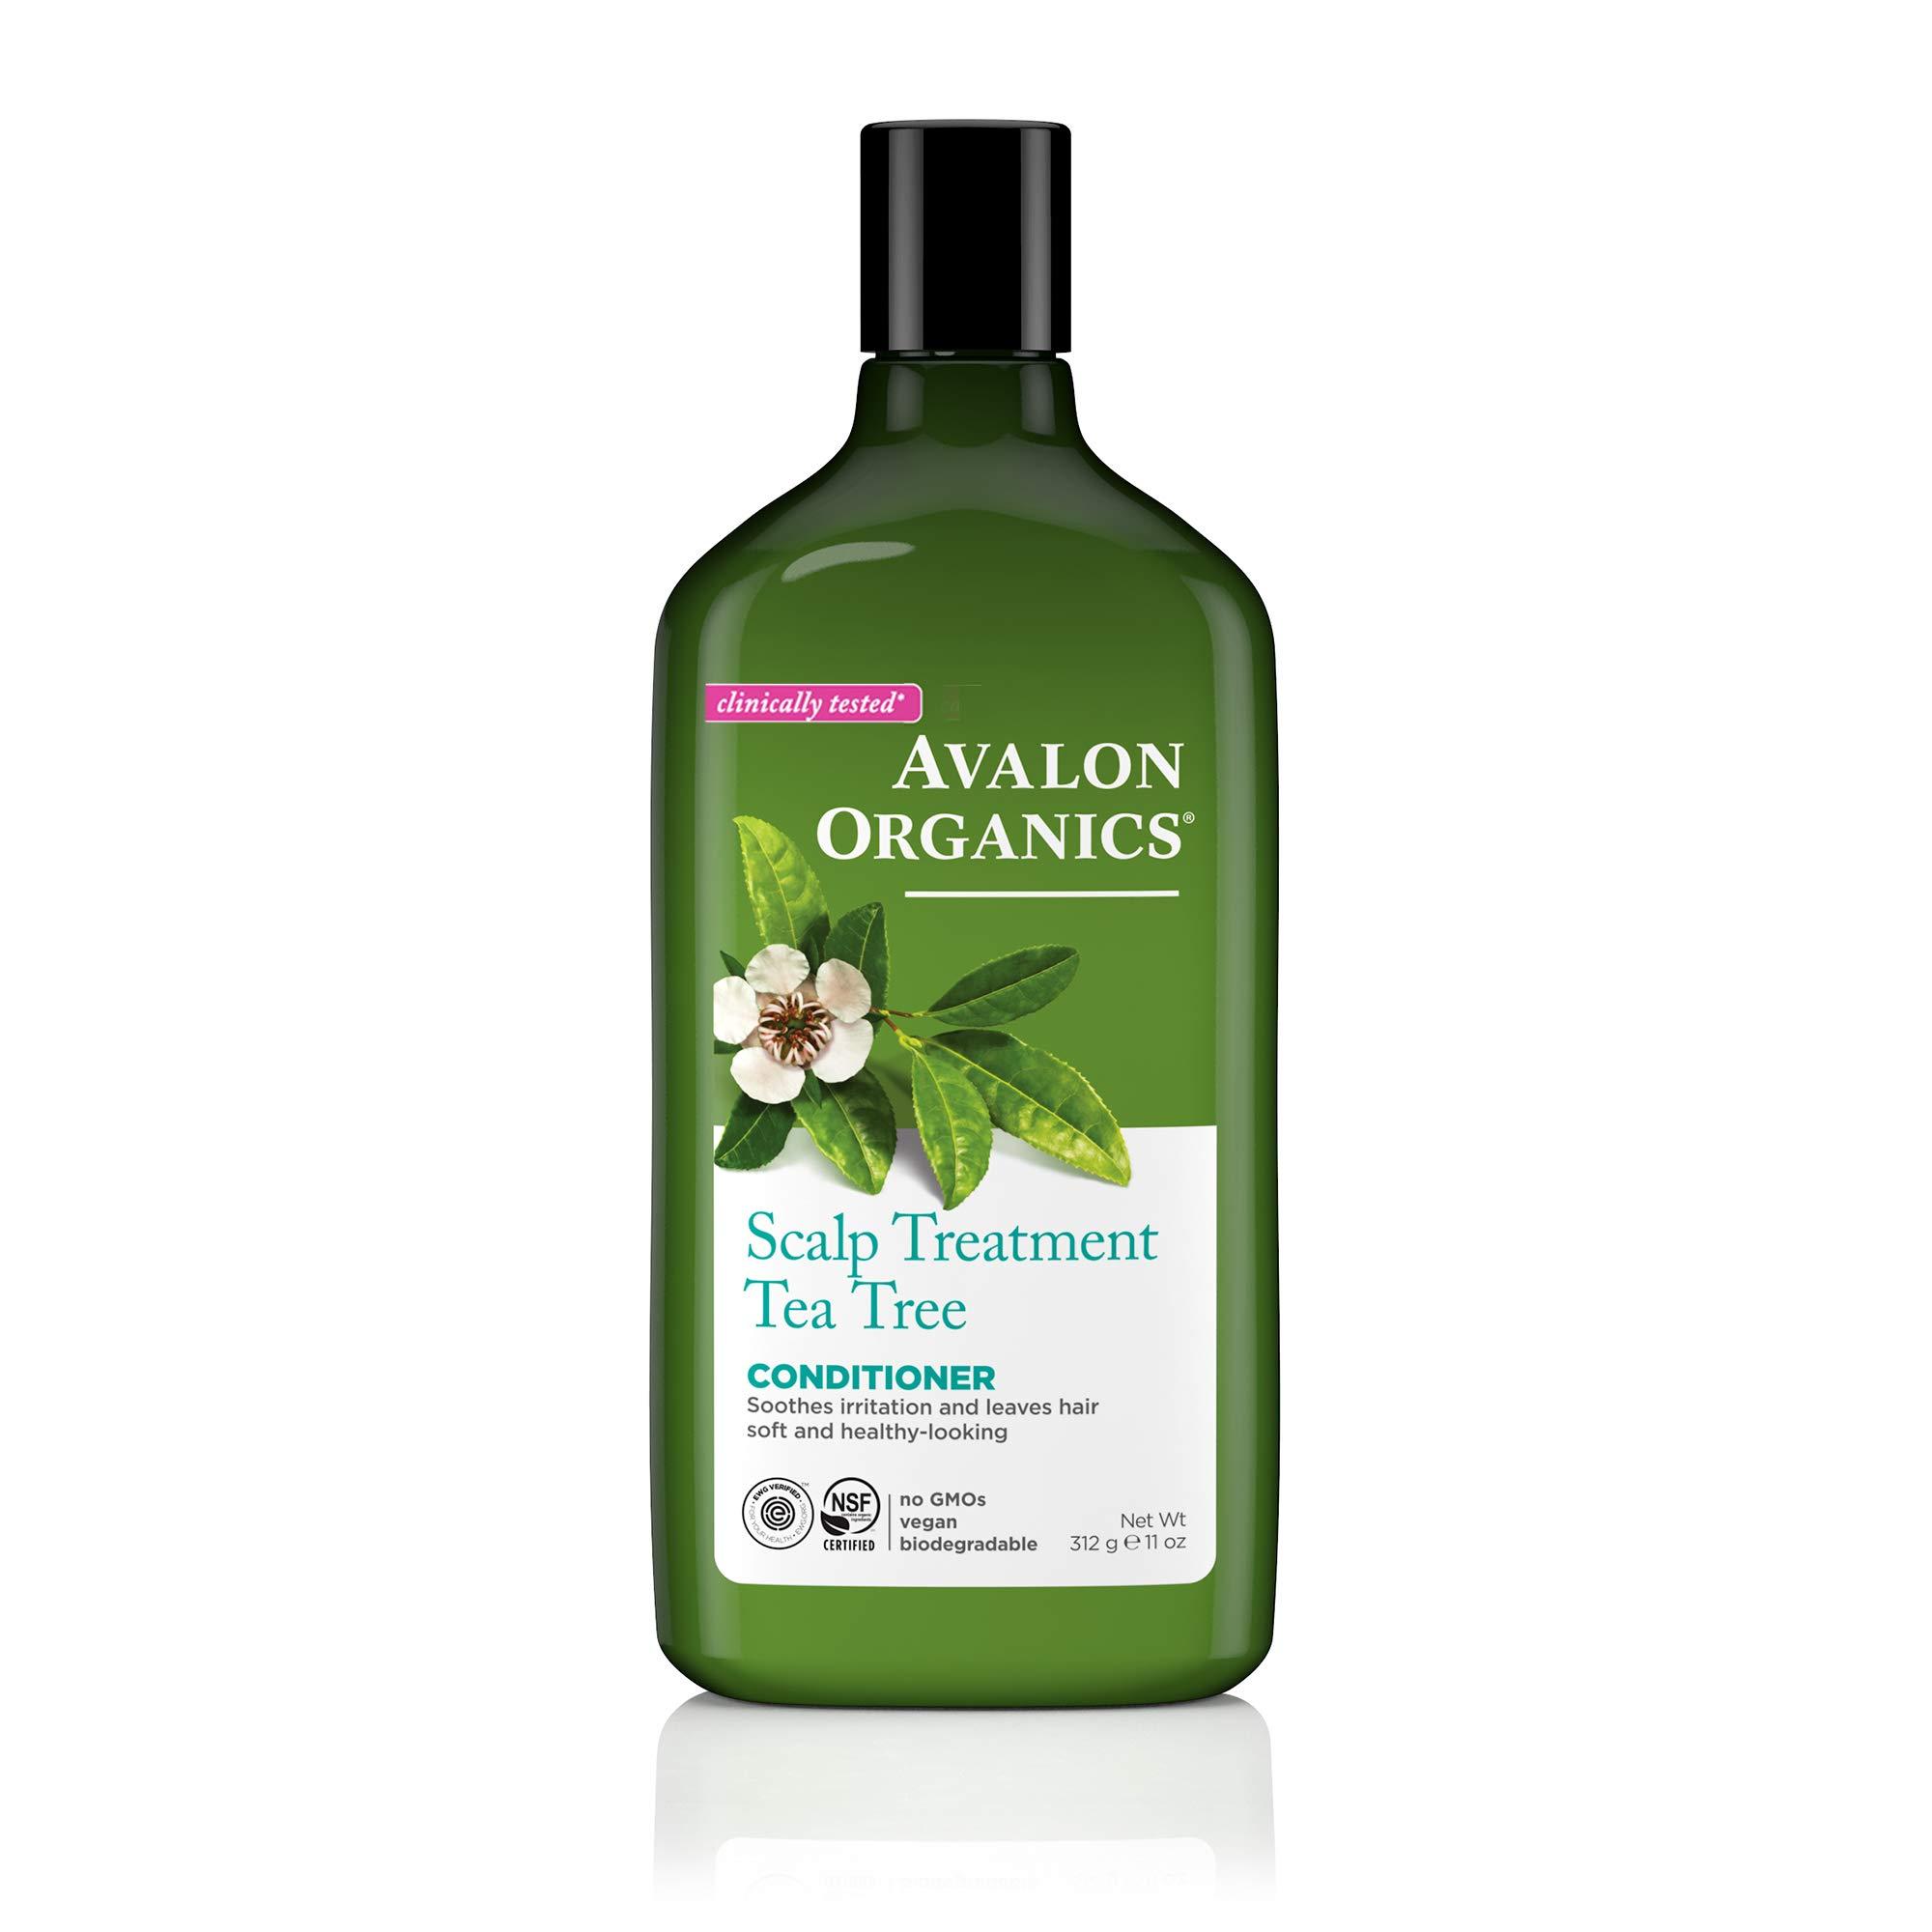 Avalon Organics Conditioner, Scalp Treatment Tea Tree, 11 Oz